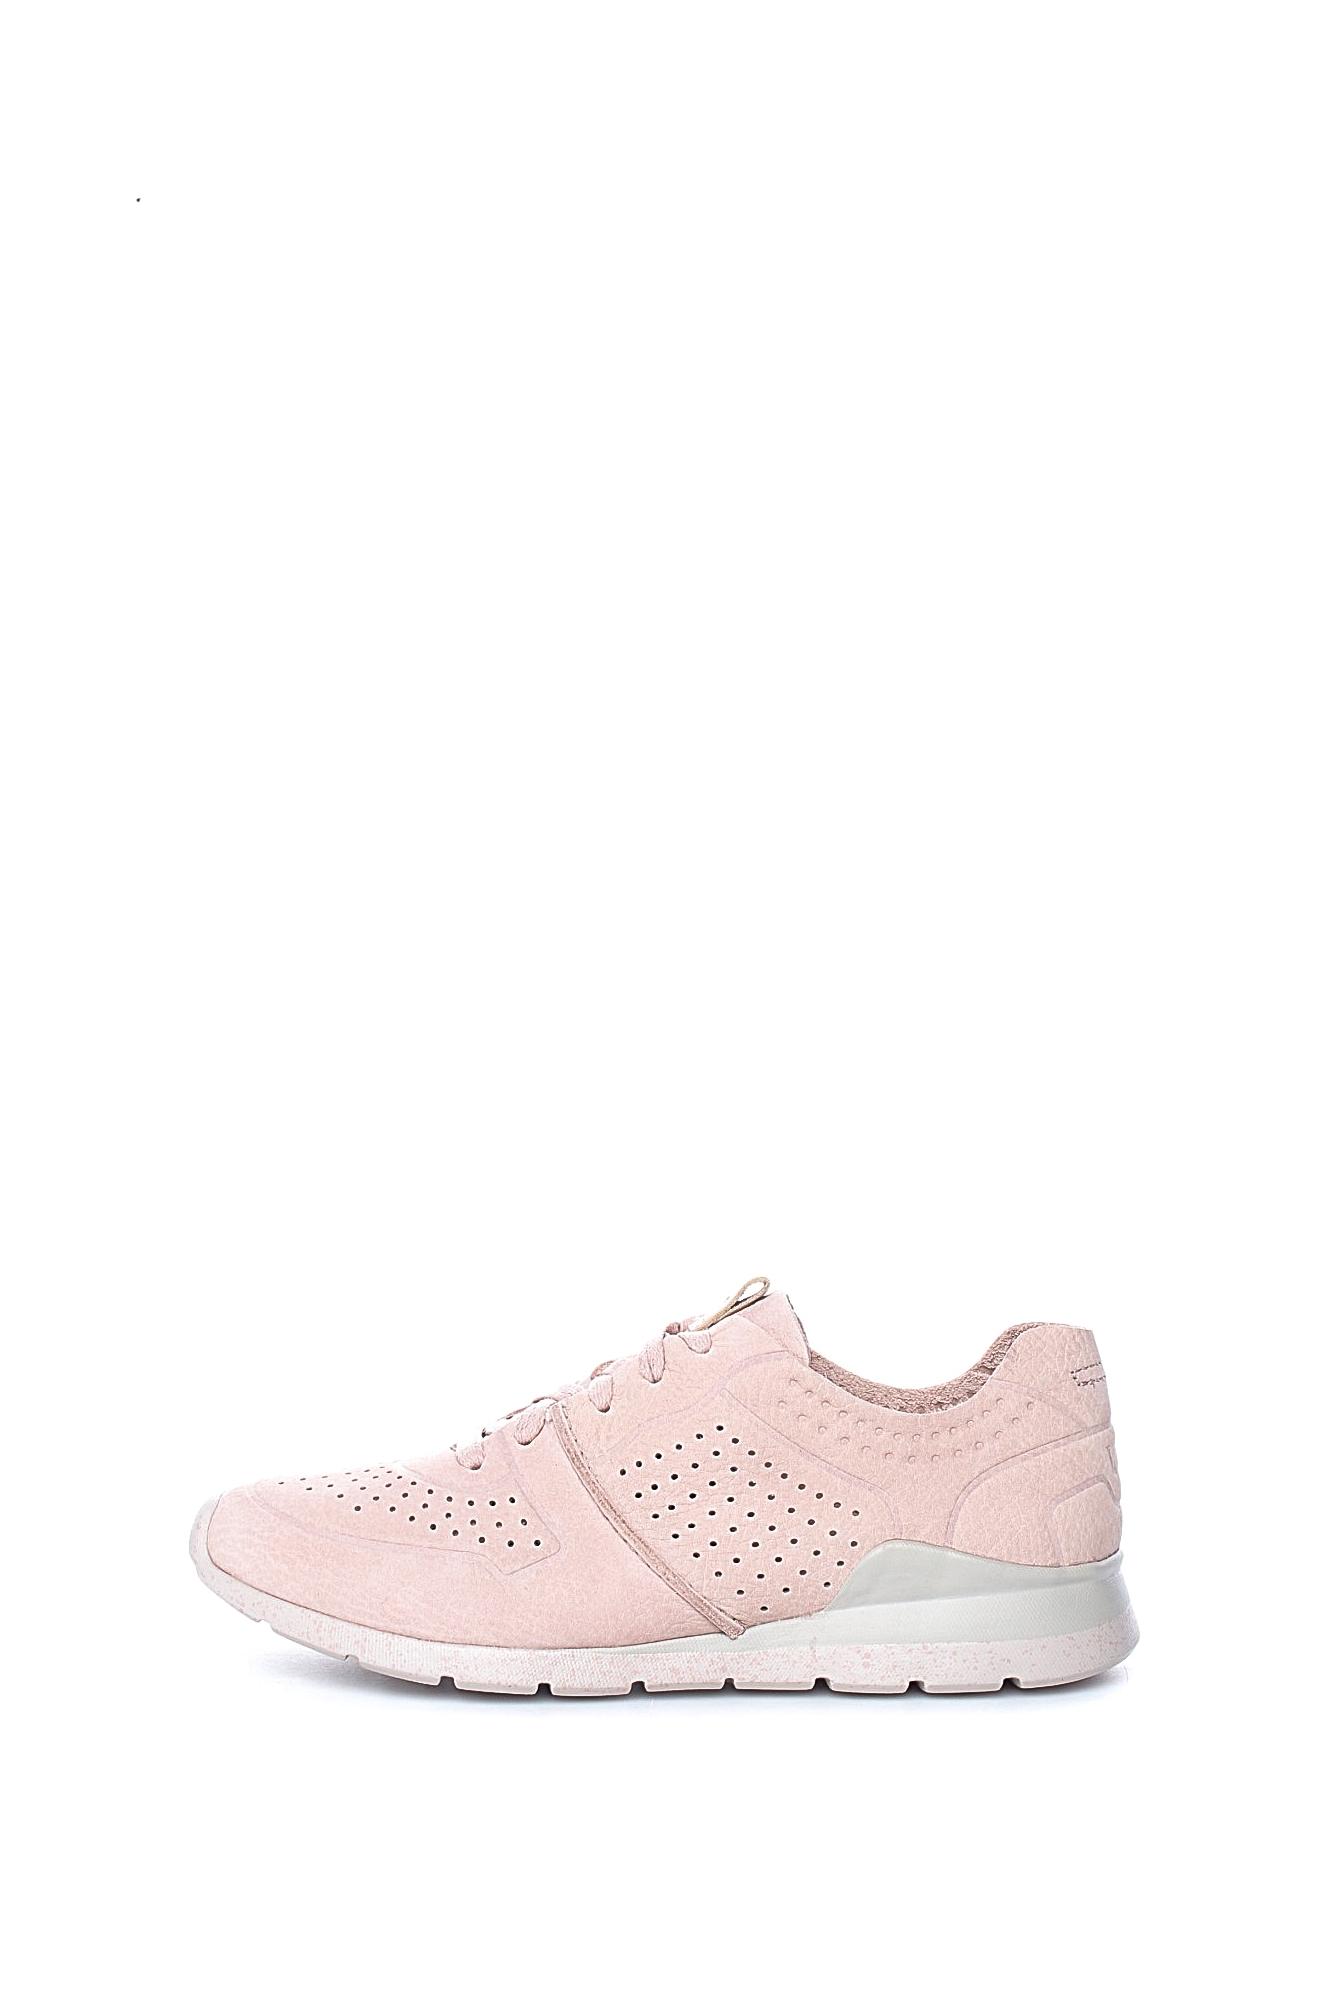 UGG – Γυναικεία παπούτσια TYE UGG AUSTRALIA ροζ